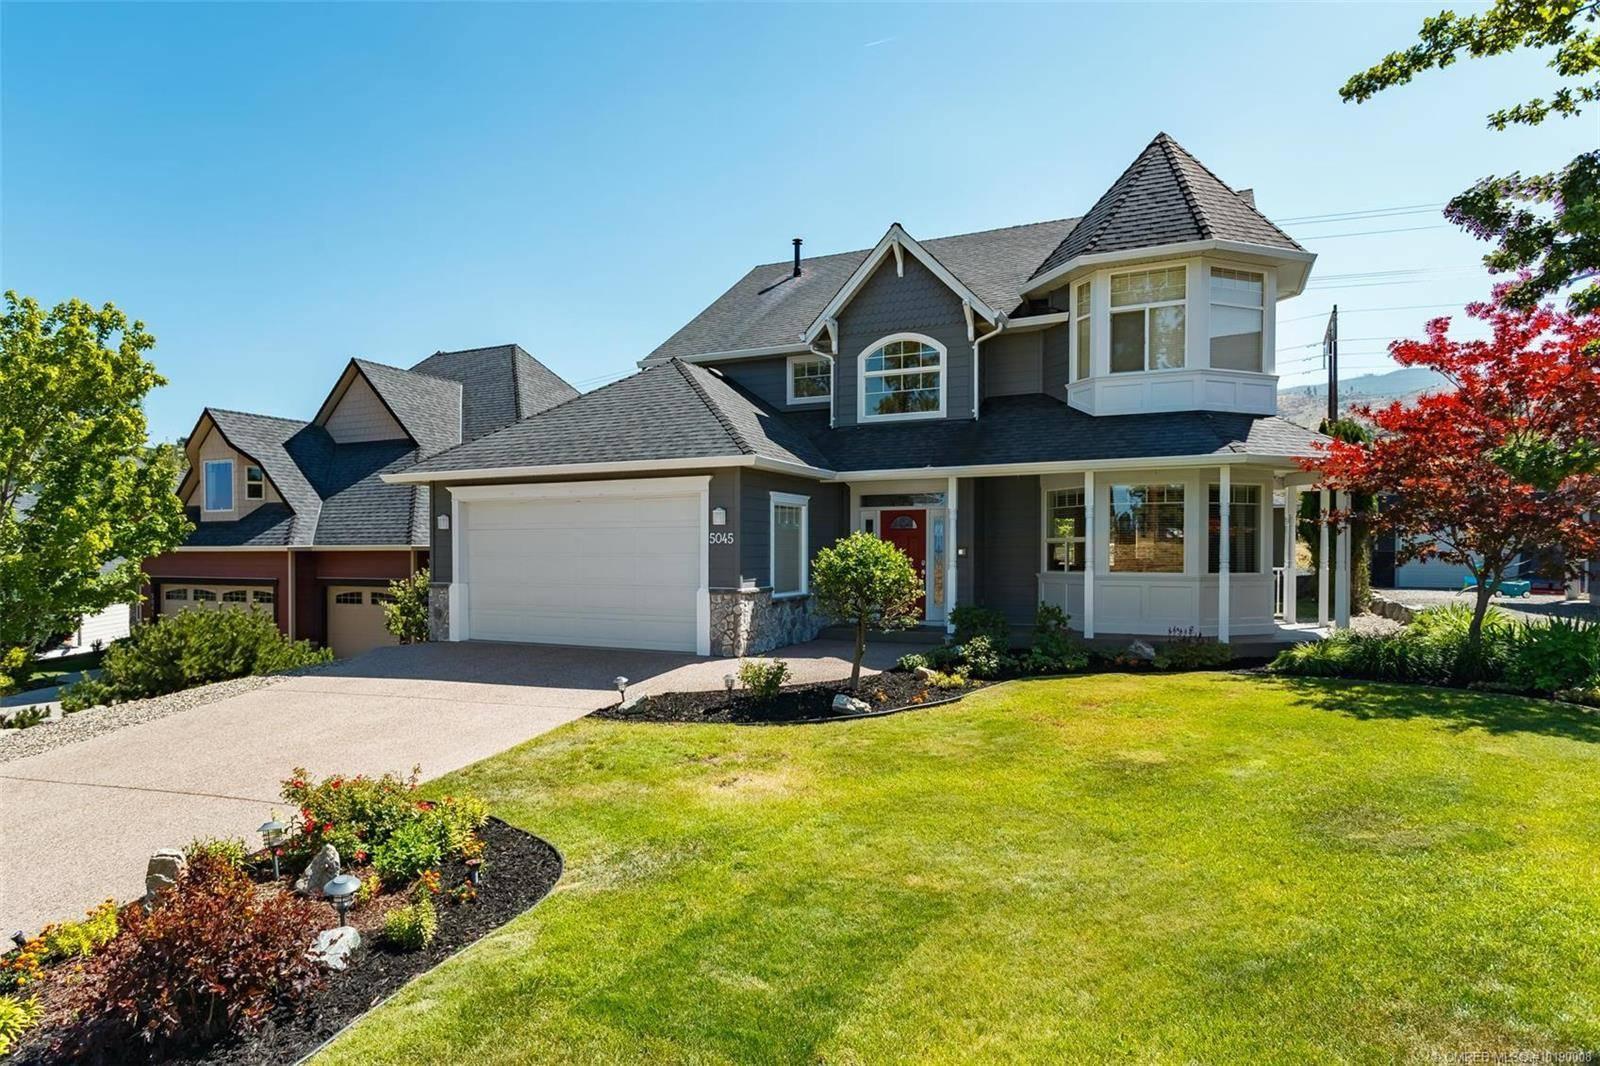 House for sale at 5045 Treadgold Ct Kelowna British Columbia - MLS: 10190008